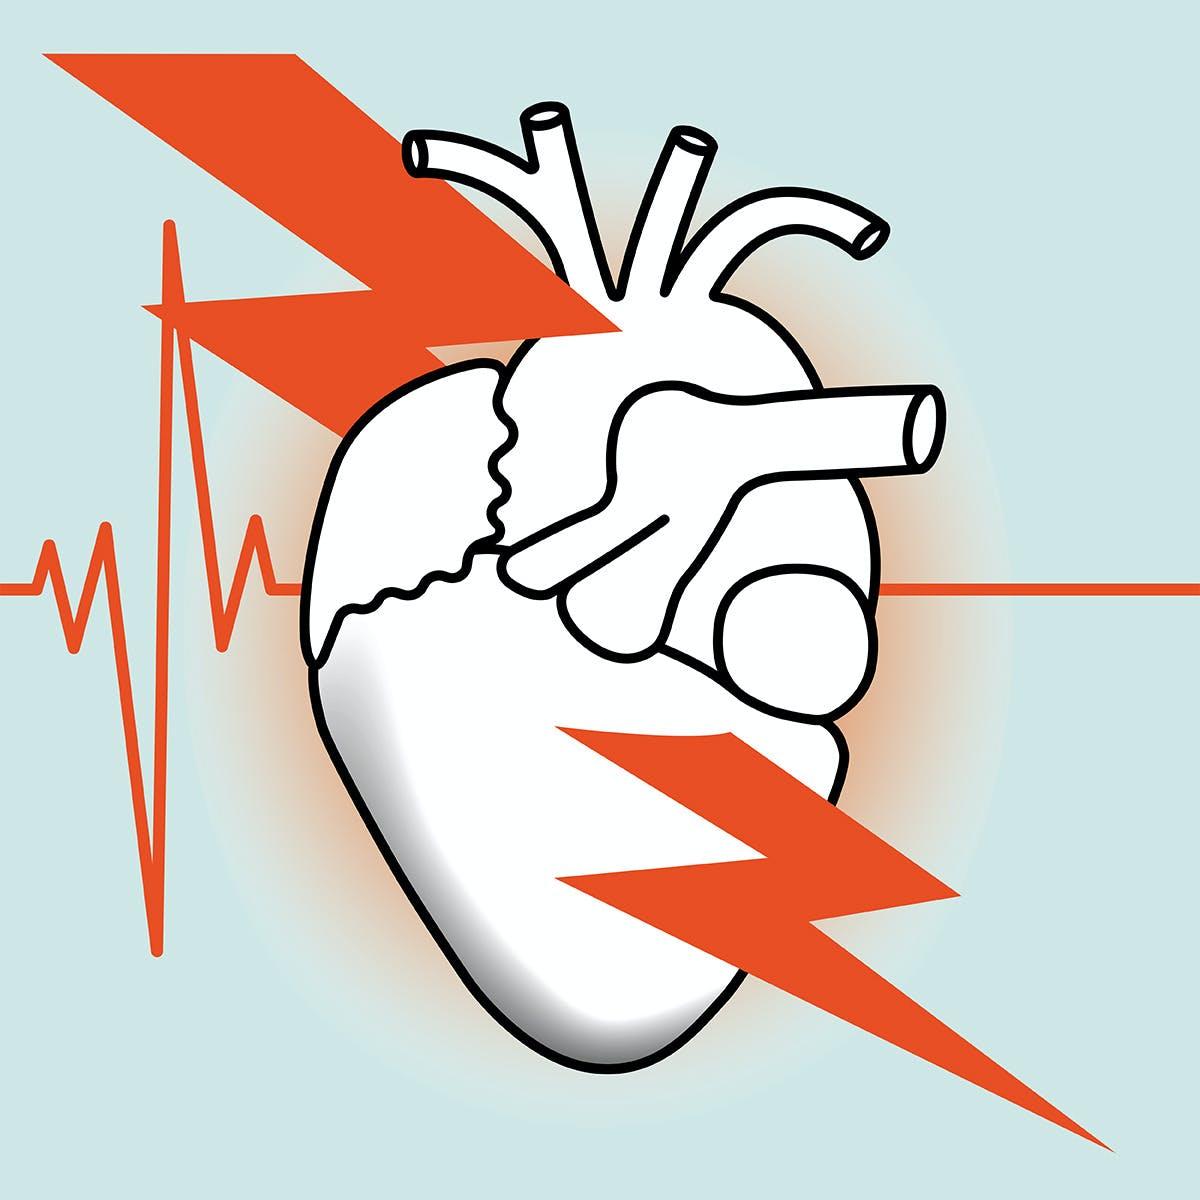 Myocardial Infarction